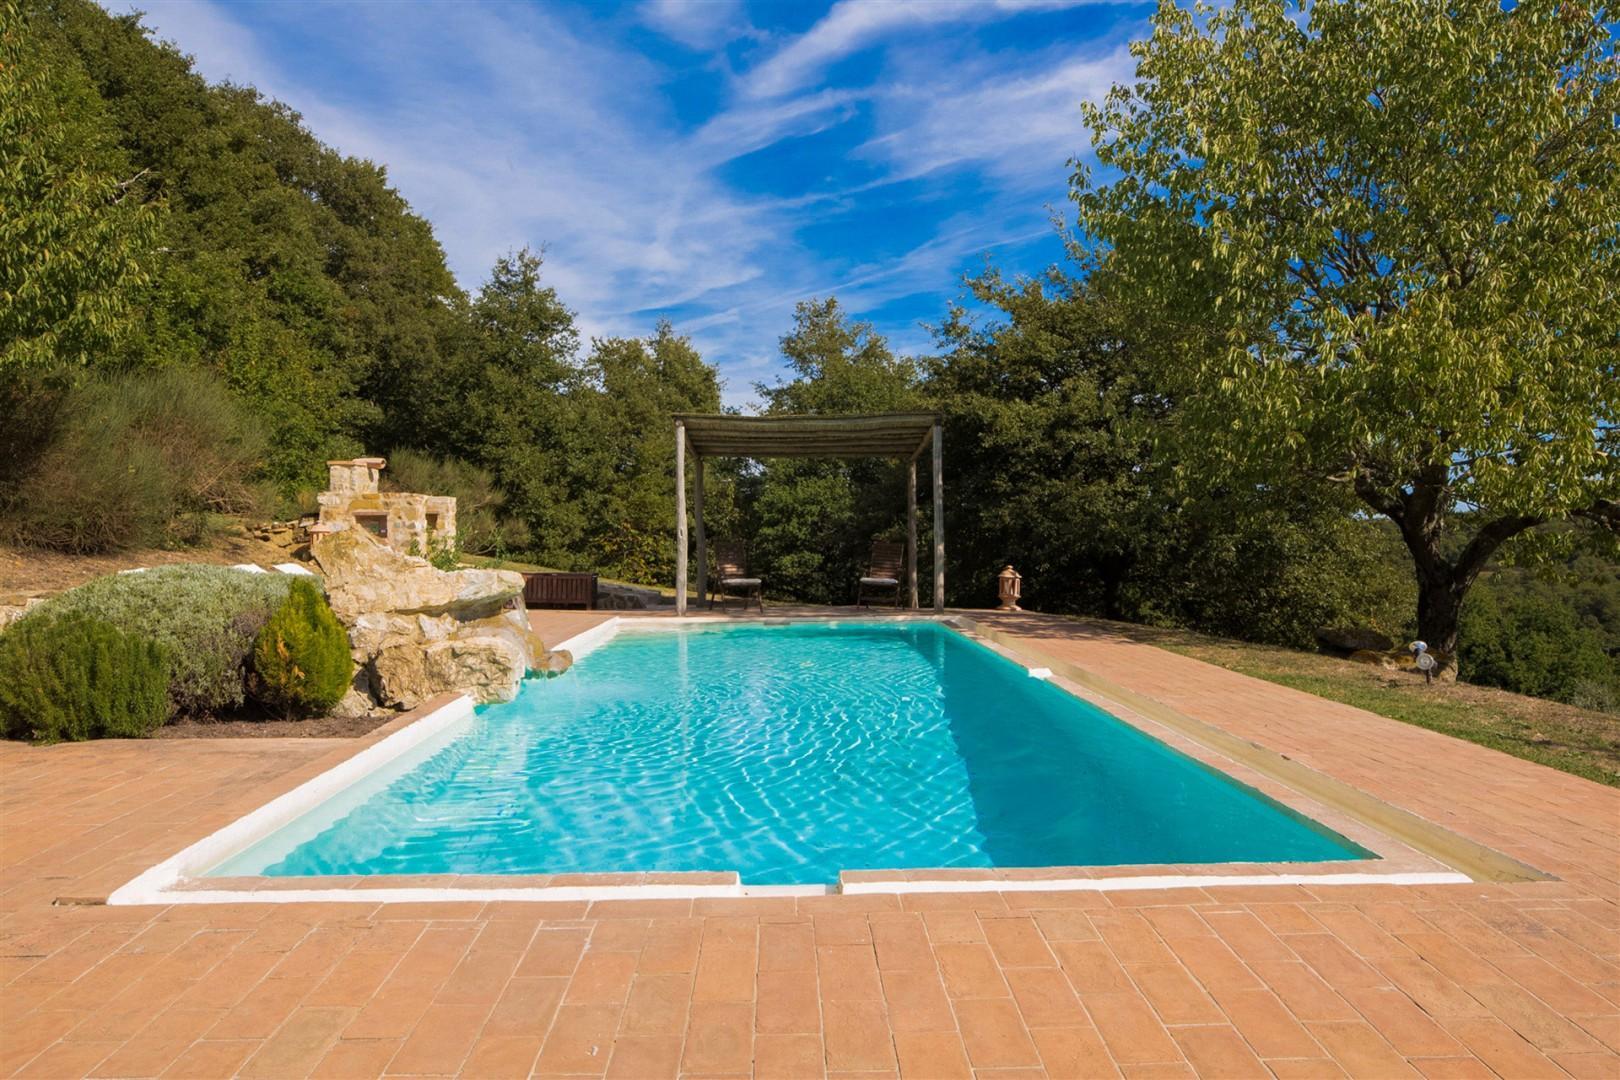 Soak up the Tuscan sun around the large swimming pool.